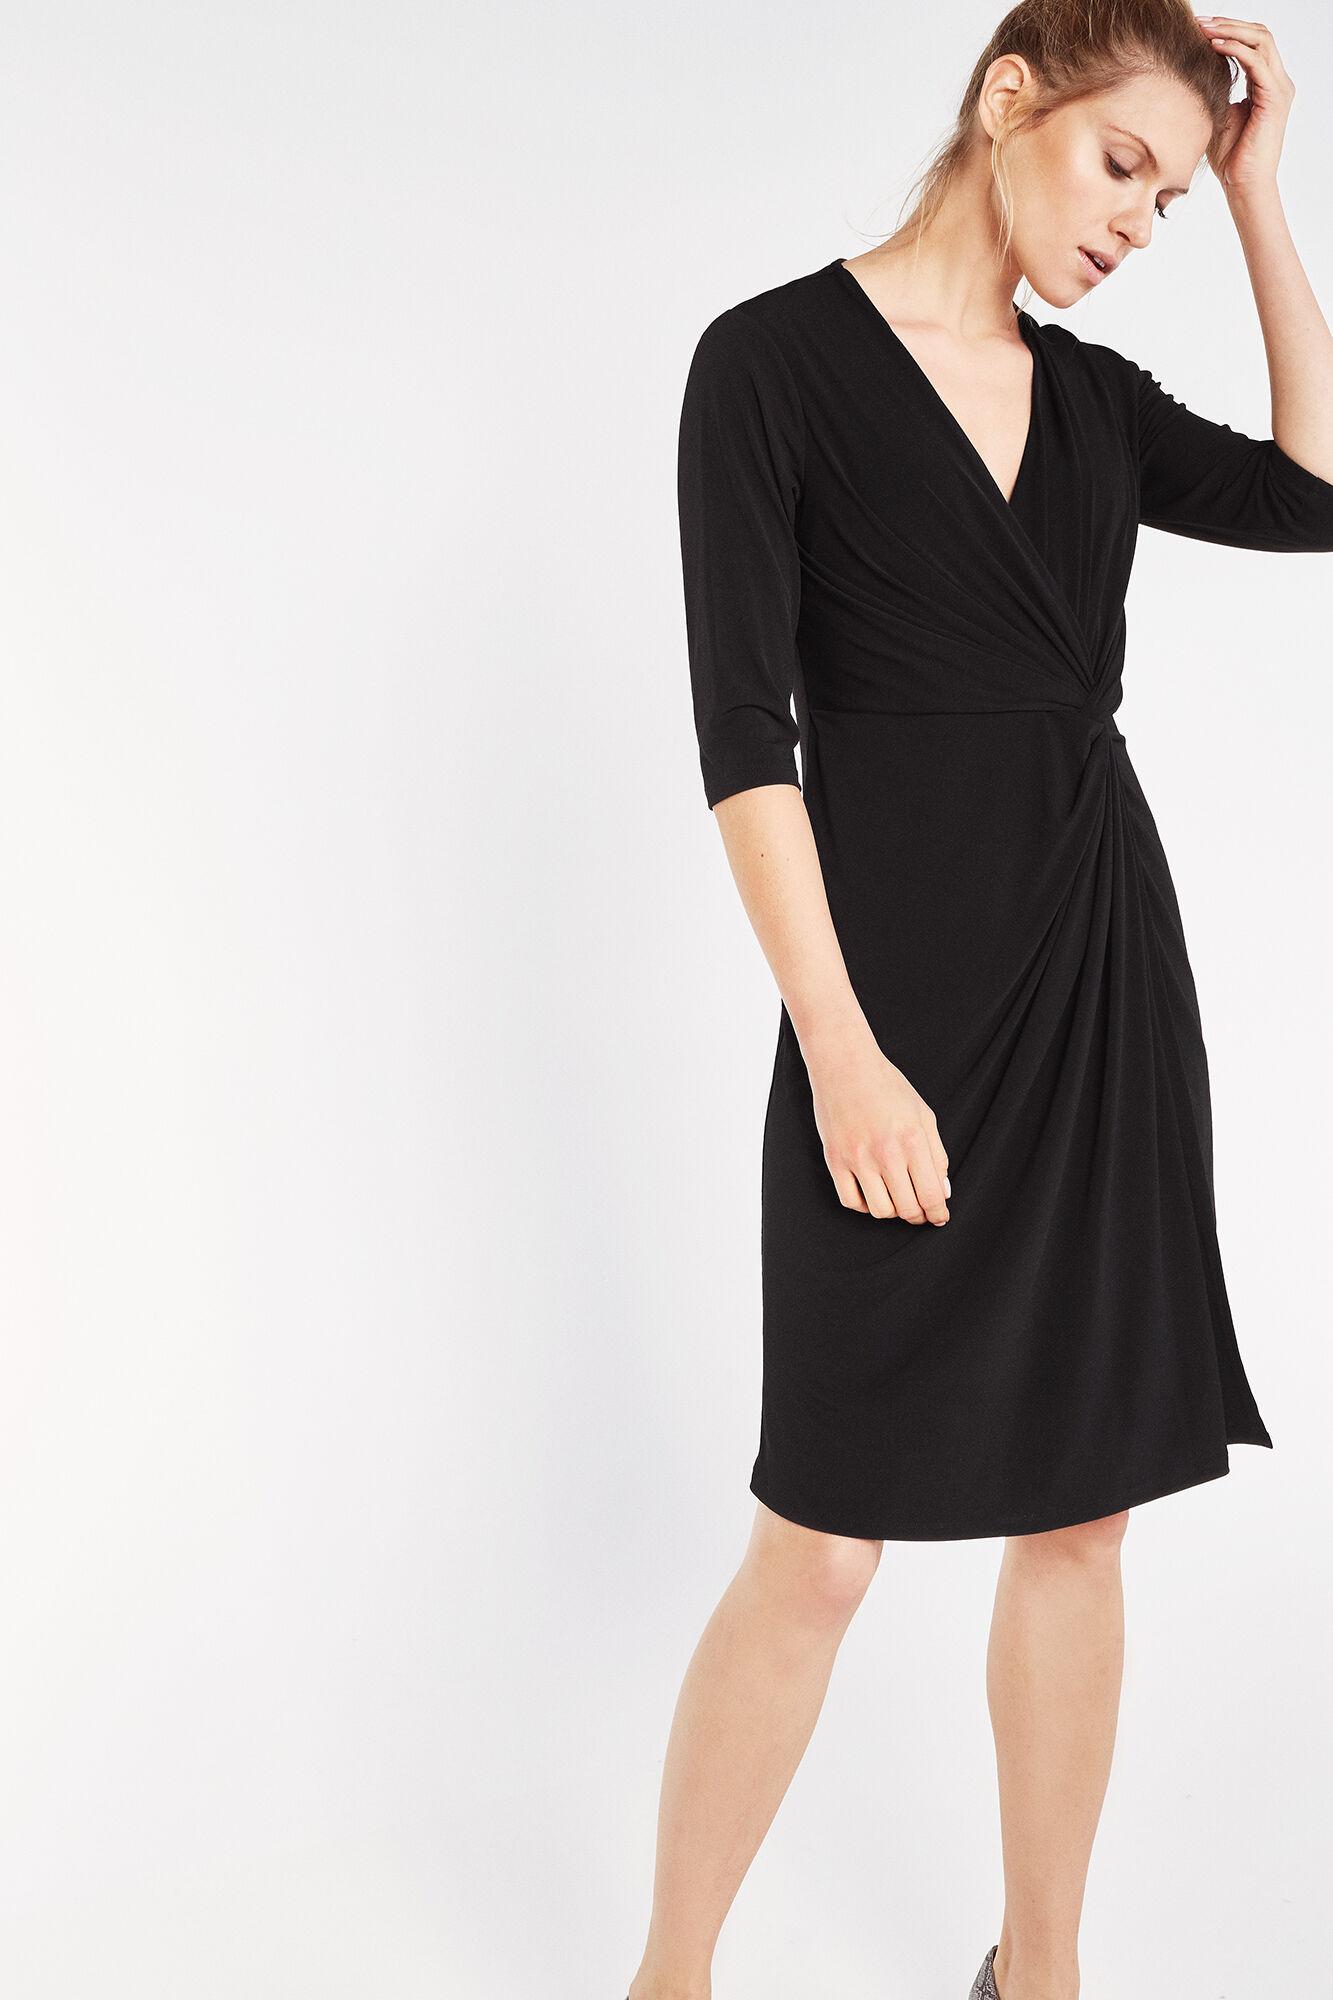 Vestido negro con escote delantero